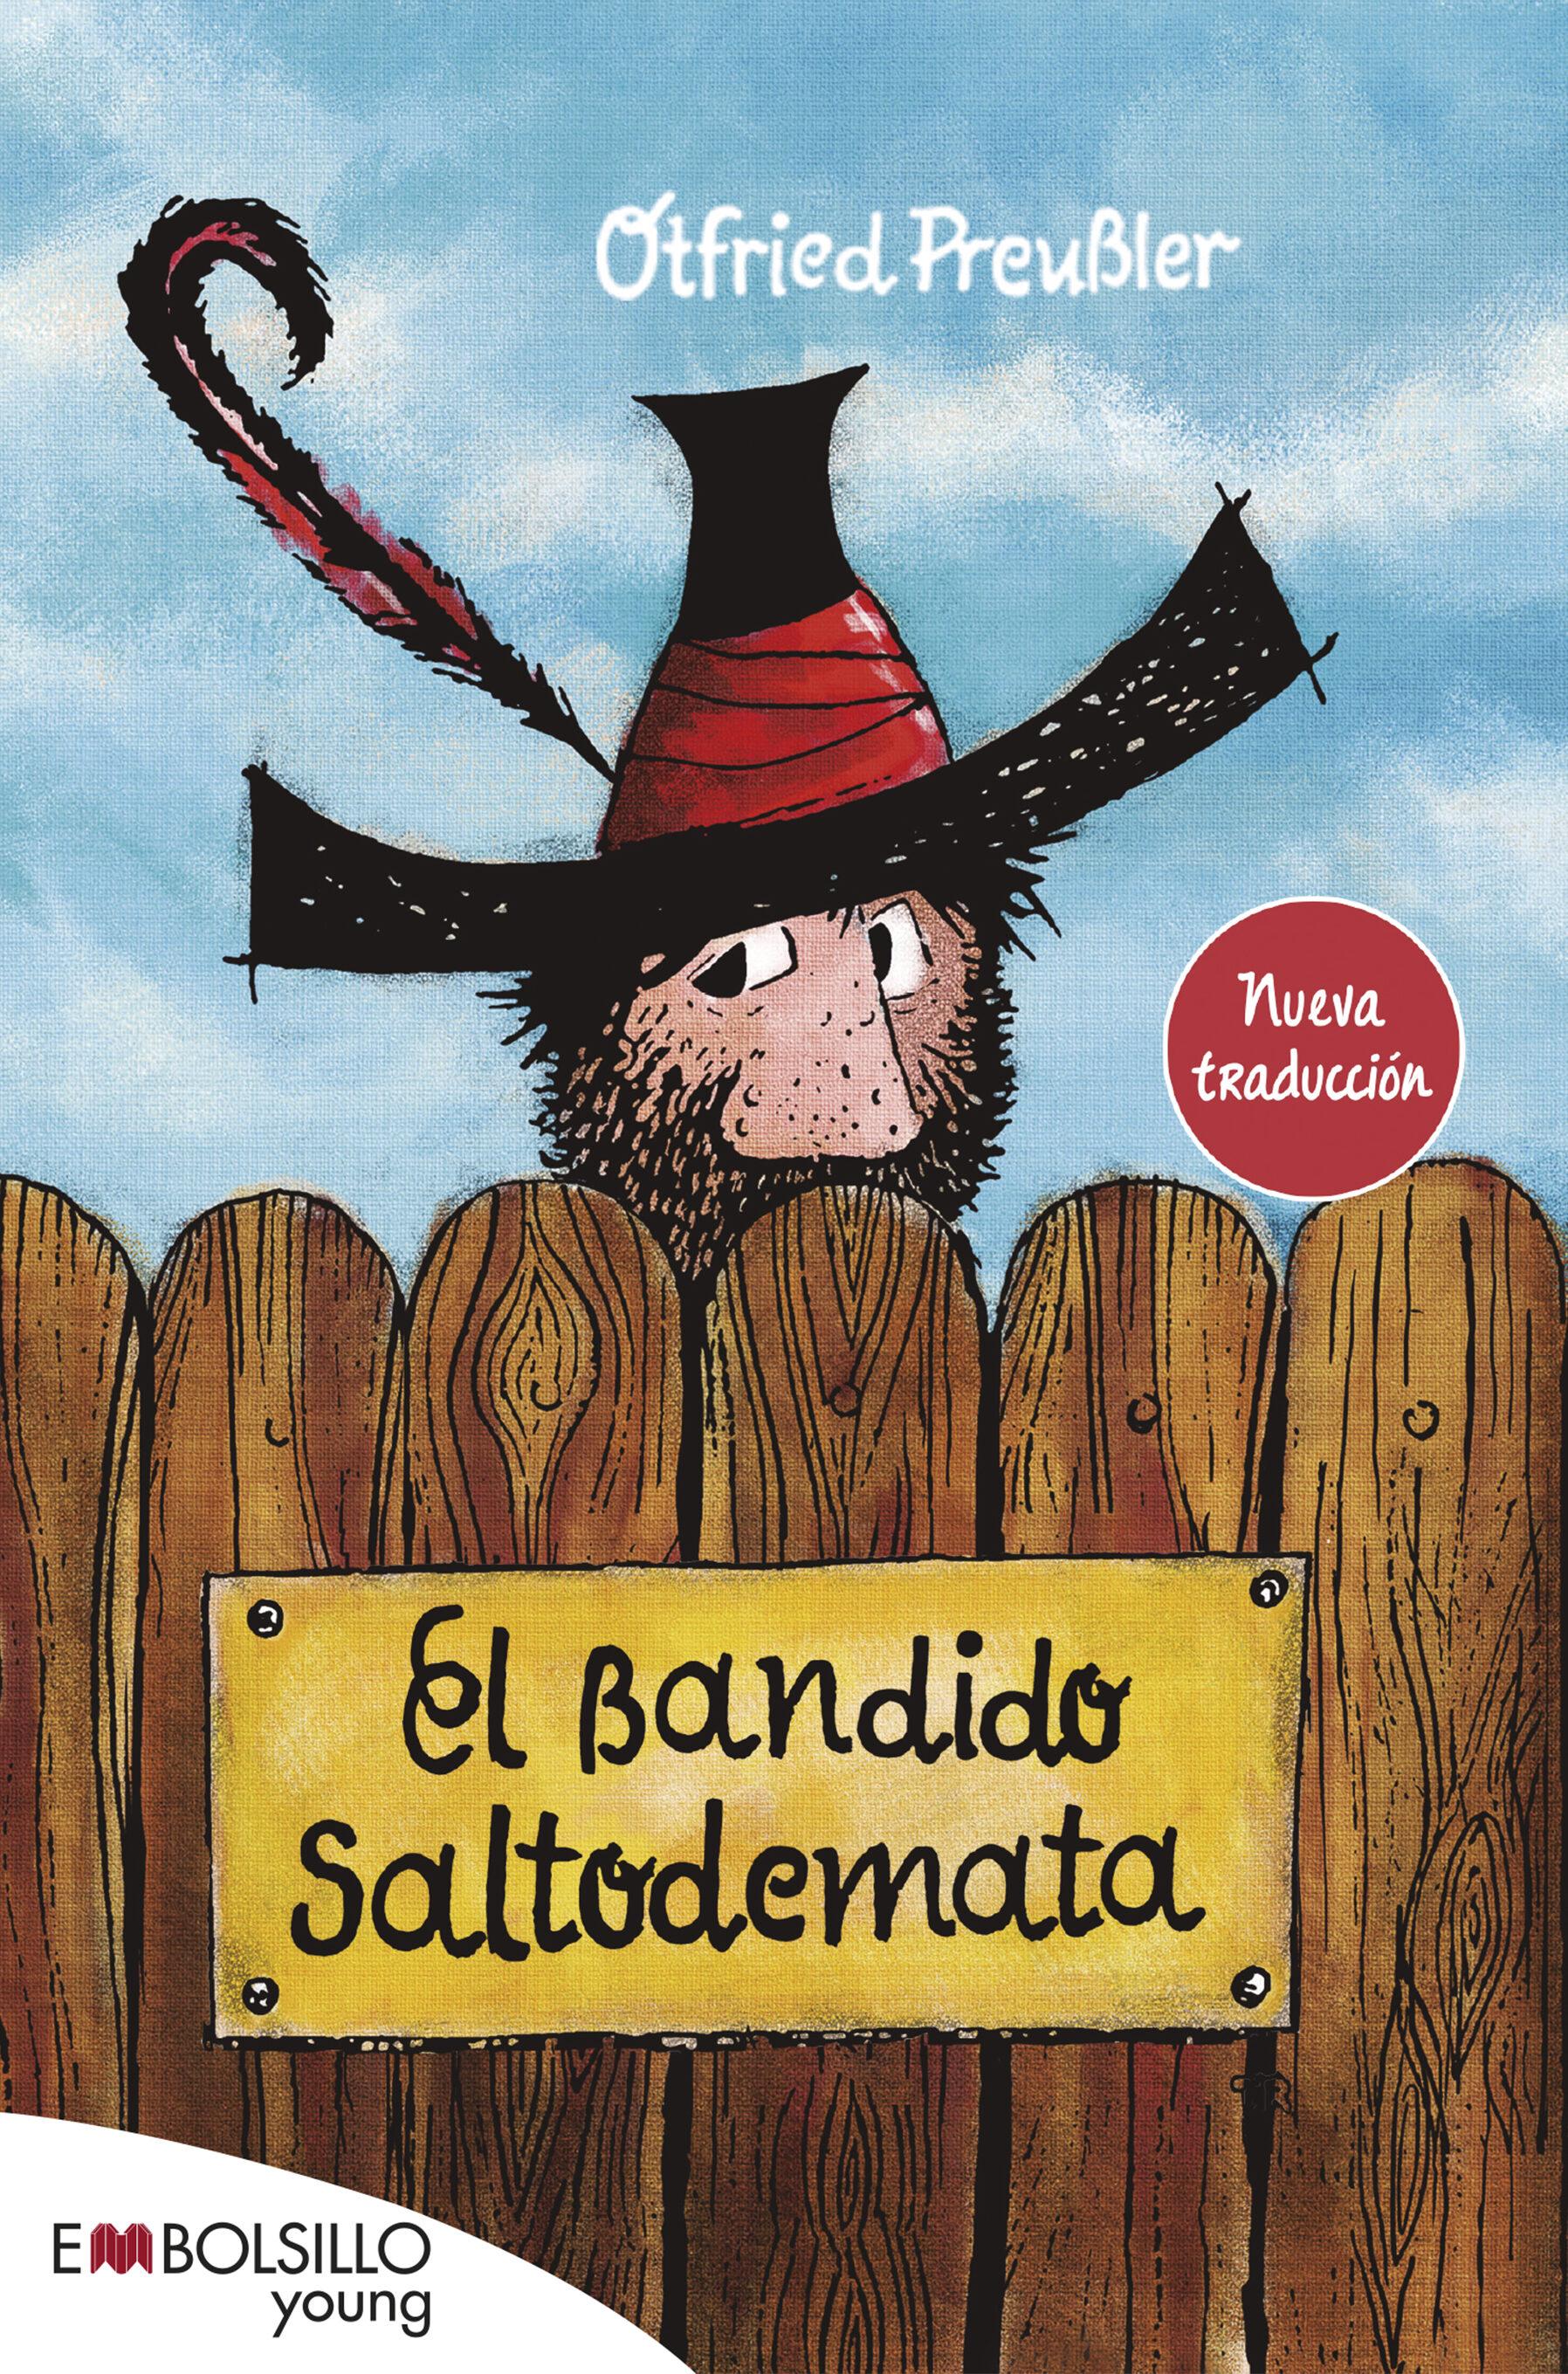 El Bandido Saltodemata - Preubler Otfried